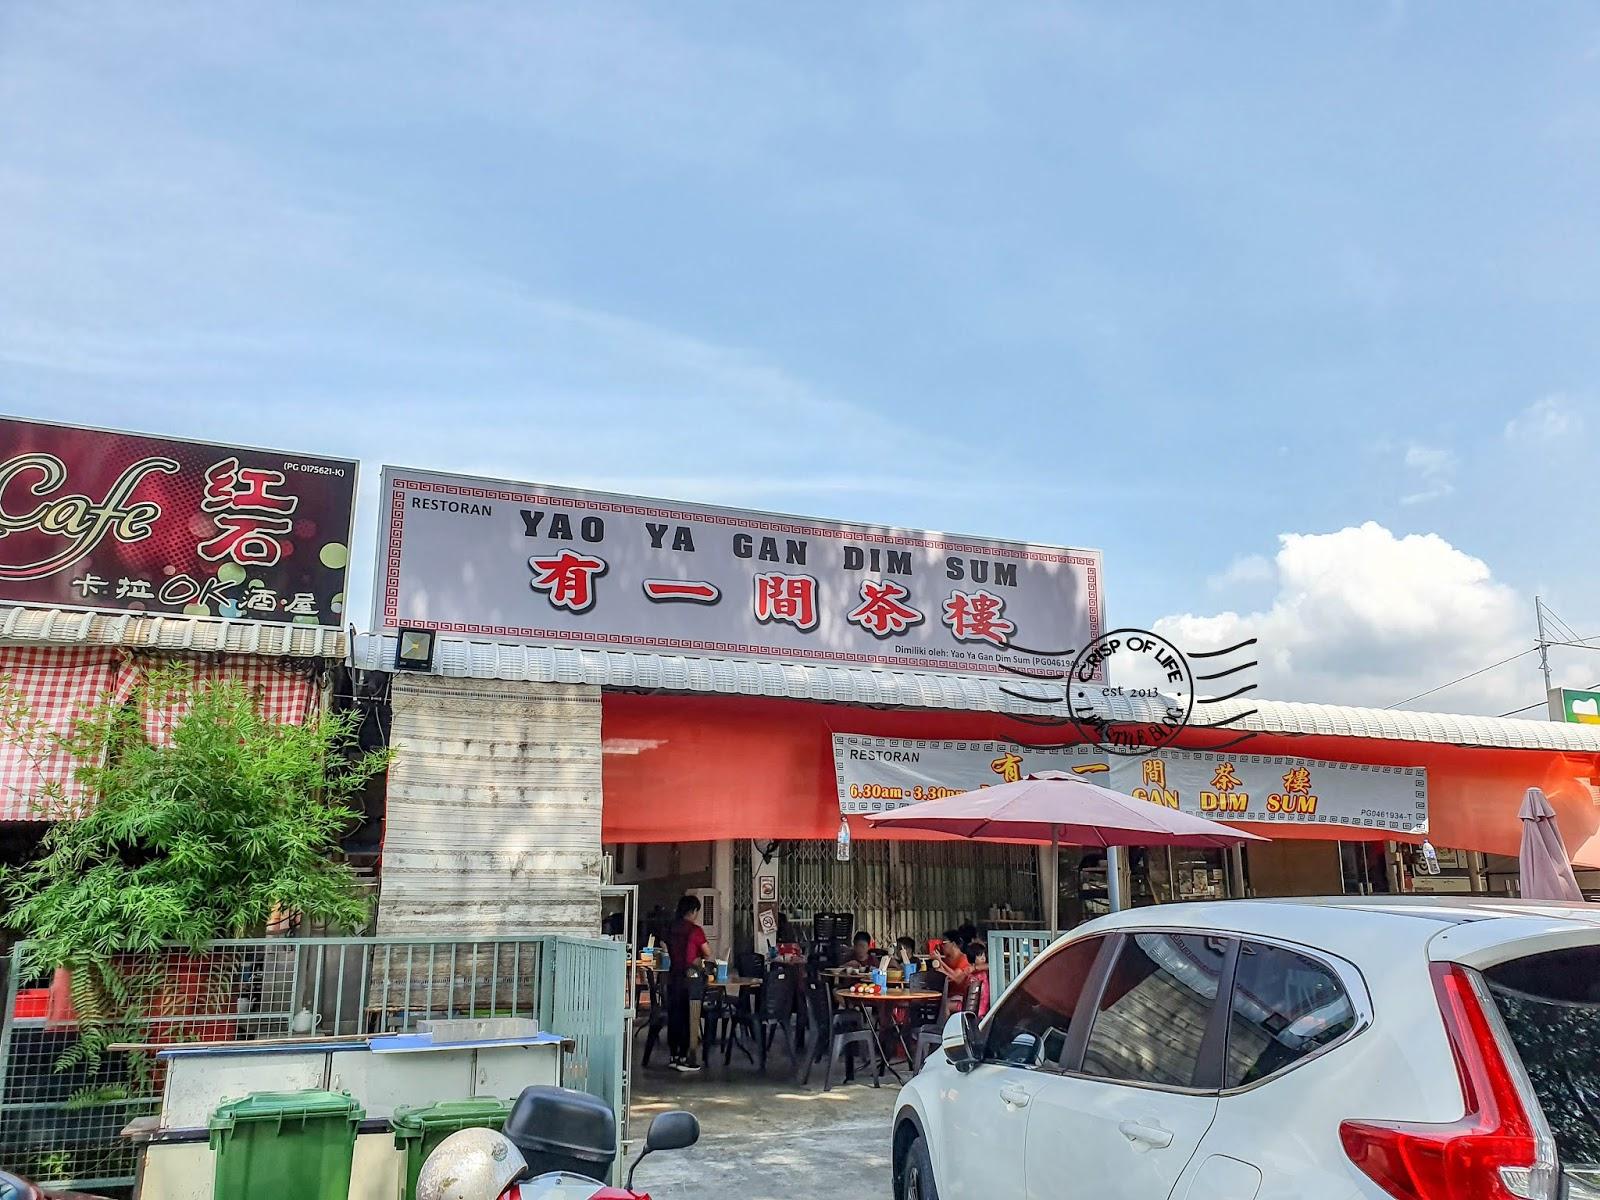 Yao Ya Gan Dim Sum 有一间茶楼 @ Batu Lanchang, Jelutong, Penang